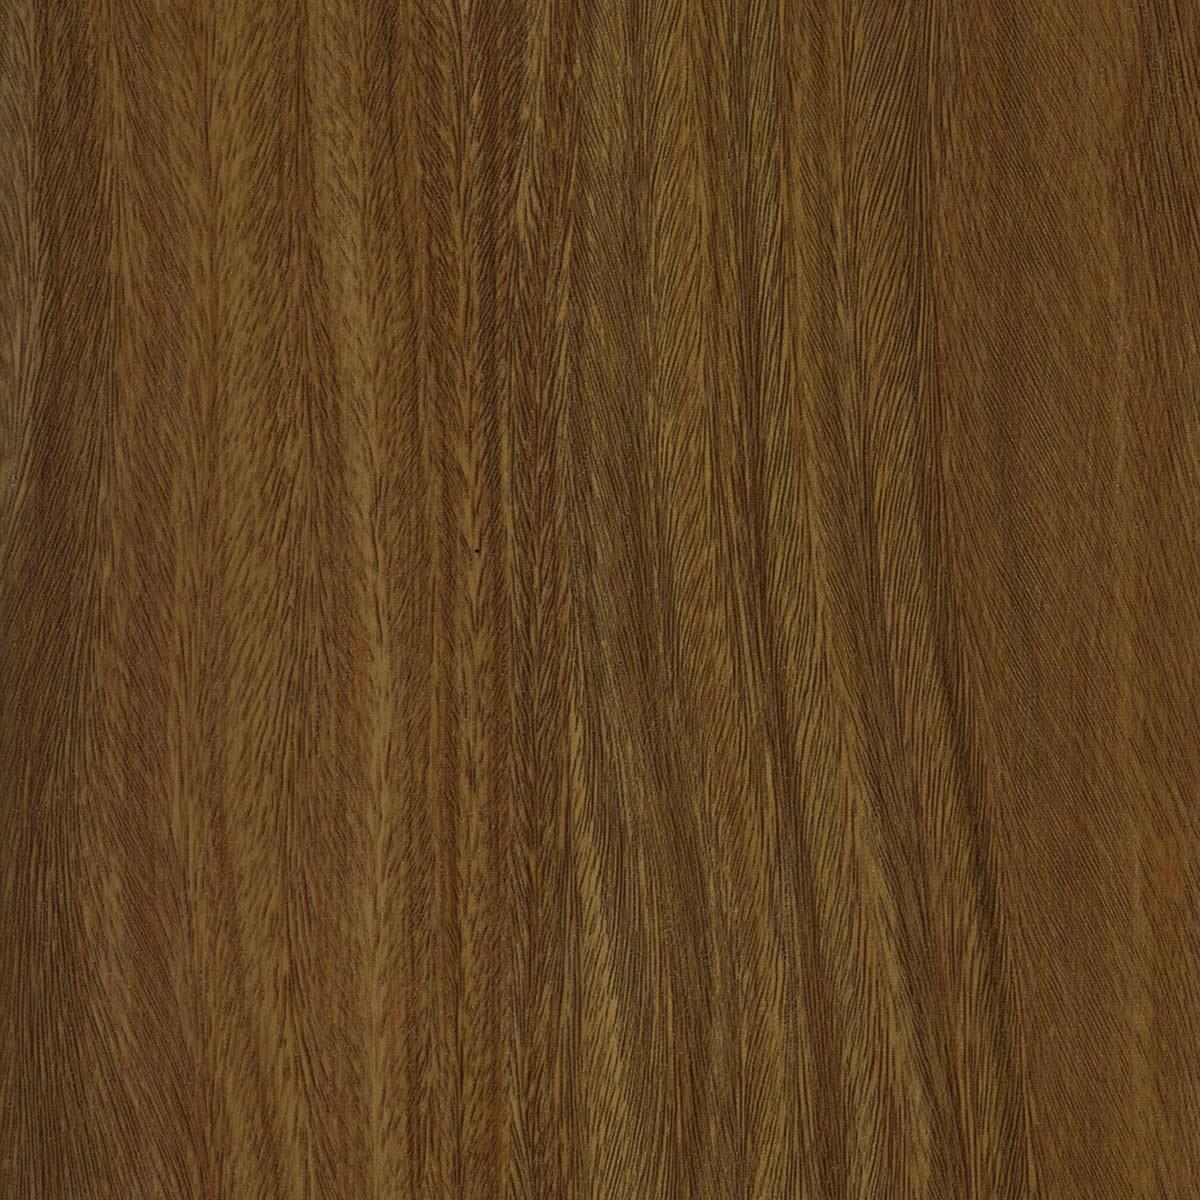 Coated panel PVC code PS-59